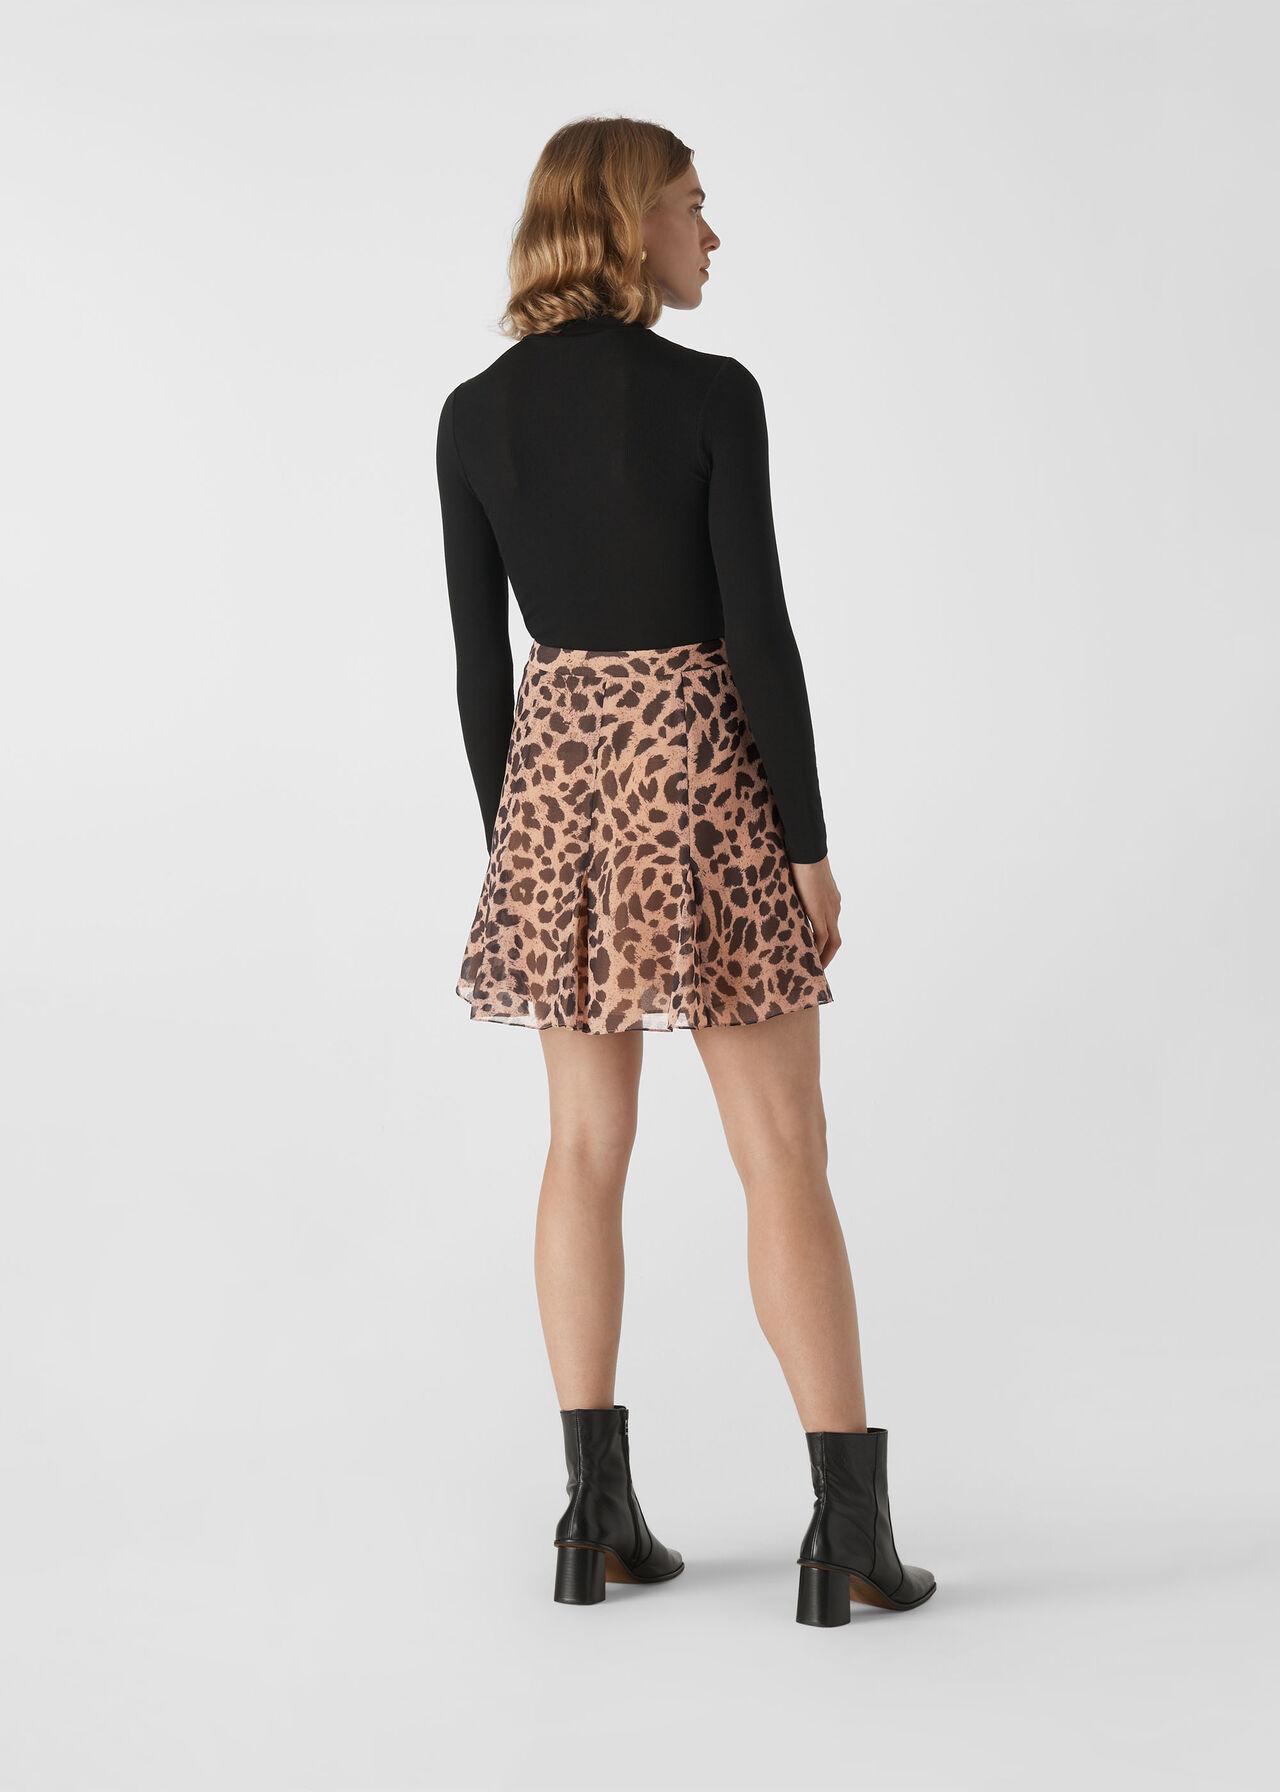 Brushed Cheetah Flippy Skirt Leopard Print